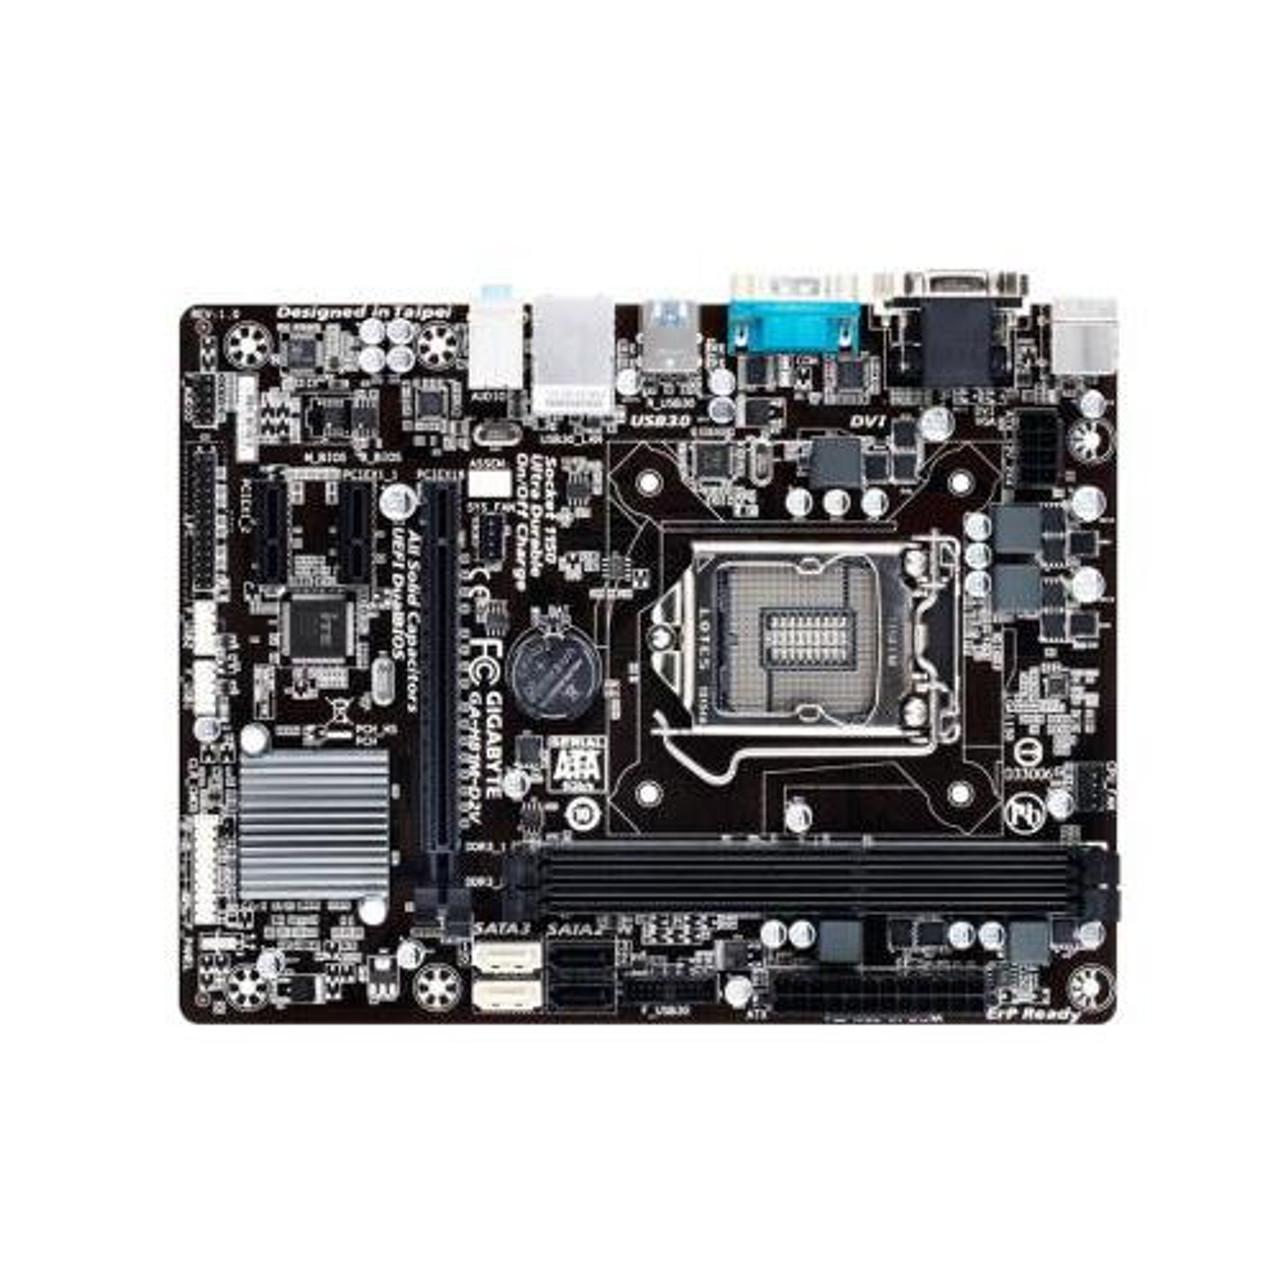 Gigabyte GA-H81M-S2PV -1.0- motherboard micro ATX LGA1150 Socket H81 OB